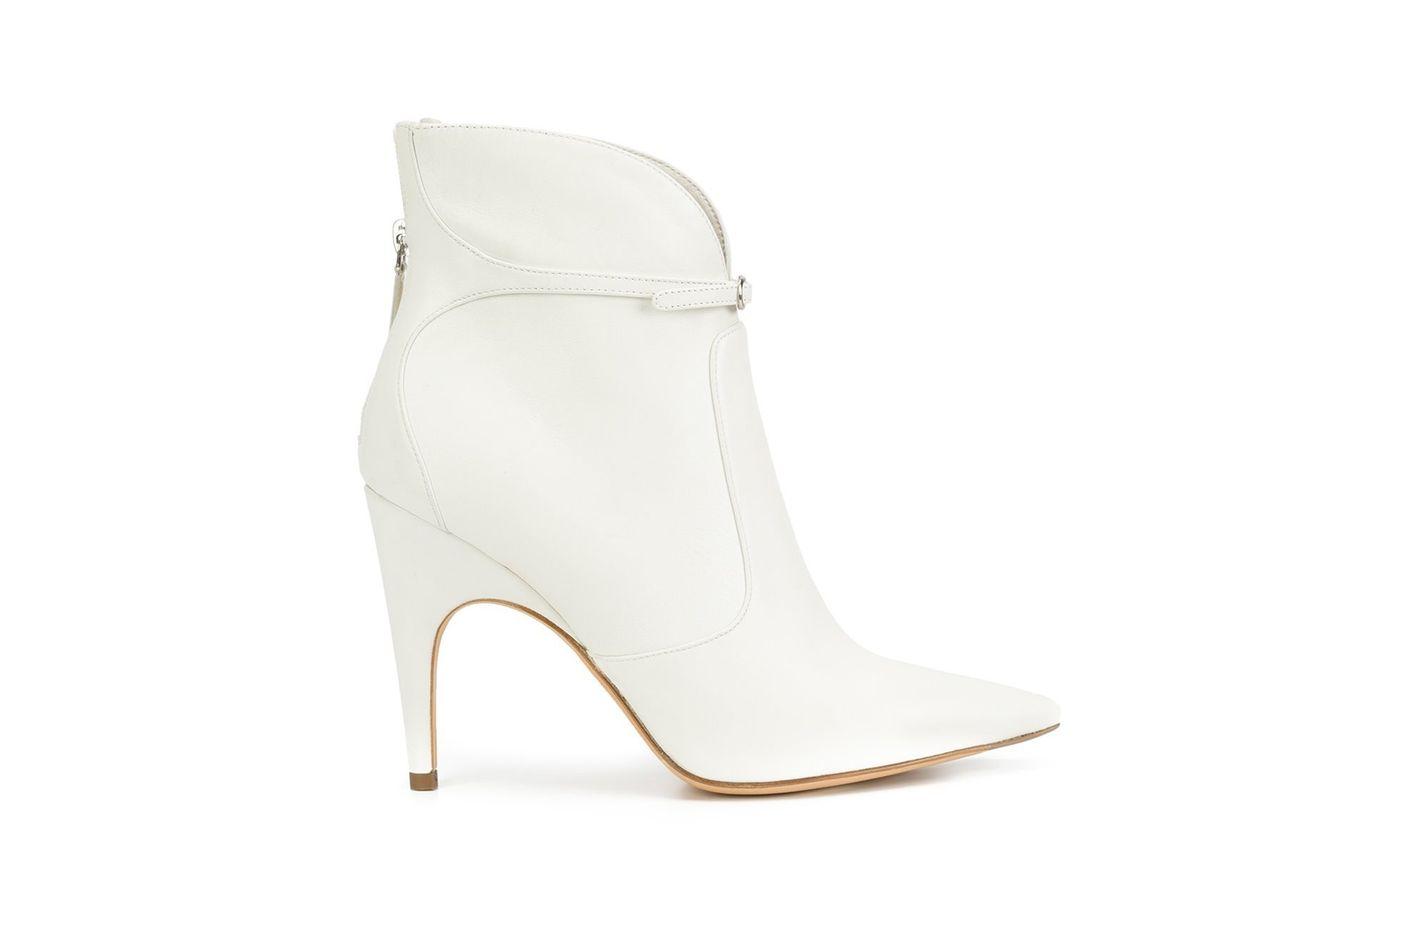 'Lana' Boots